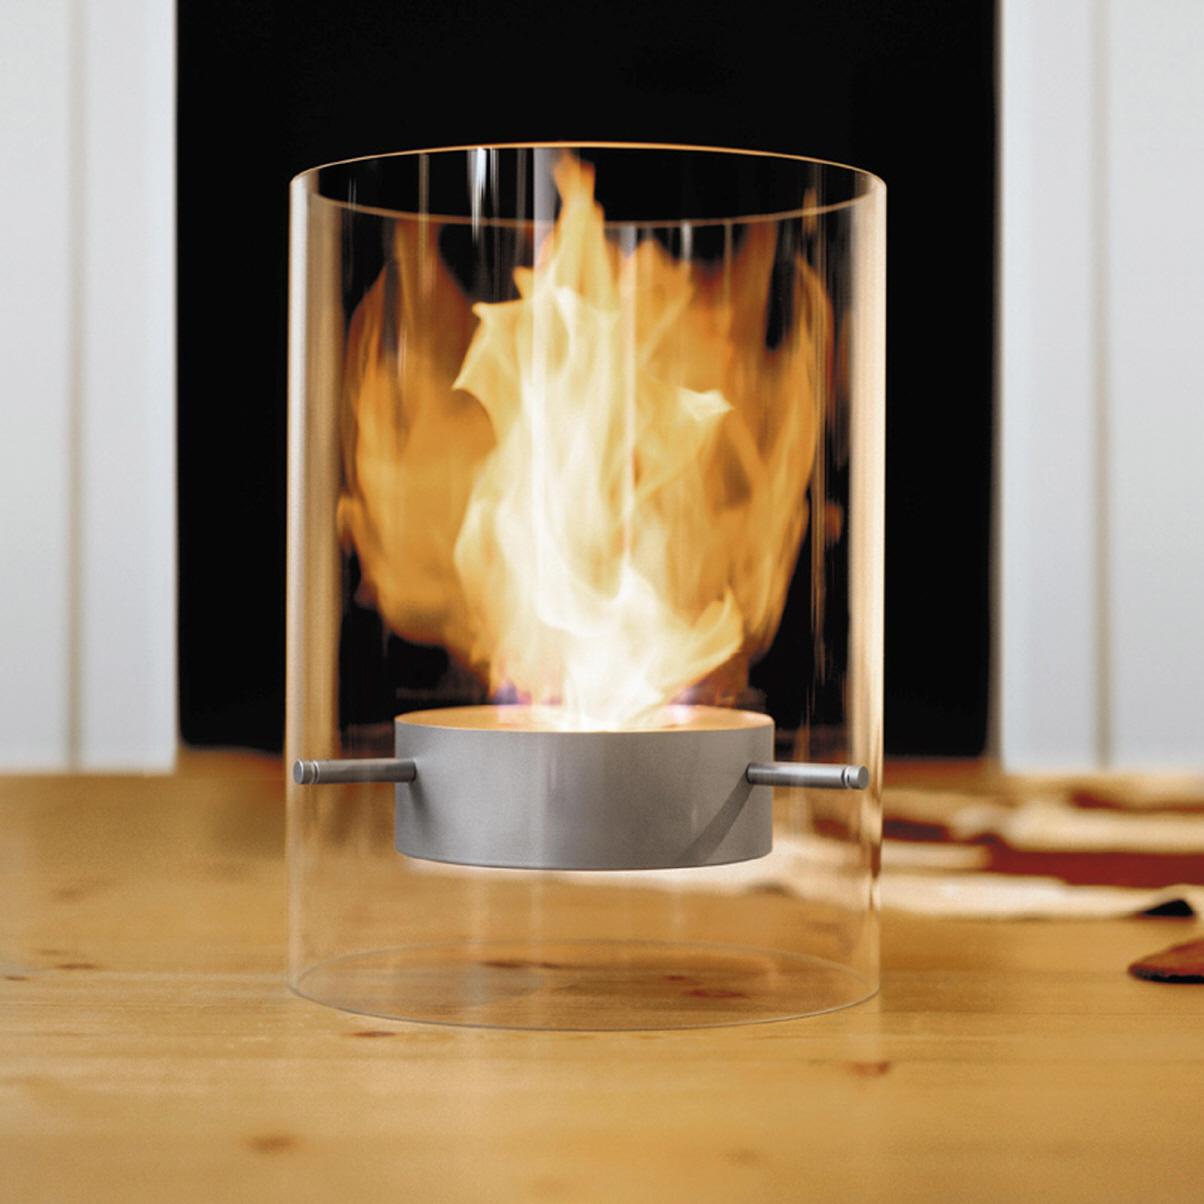 Feuerstellen Grillfeuerstellen Gelfeuerstellen Designfeuerstellen